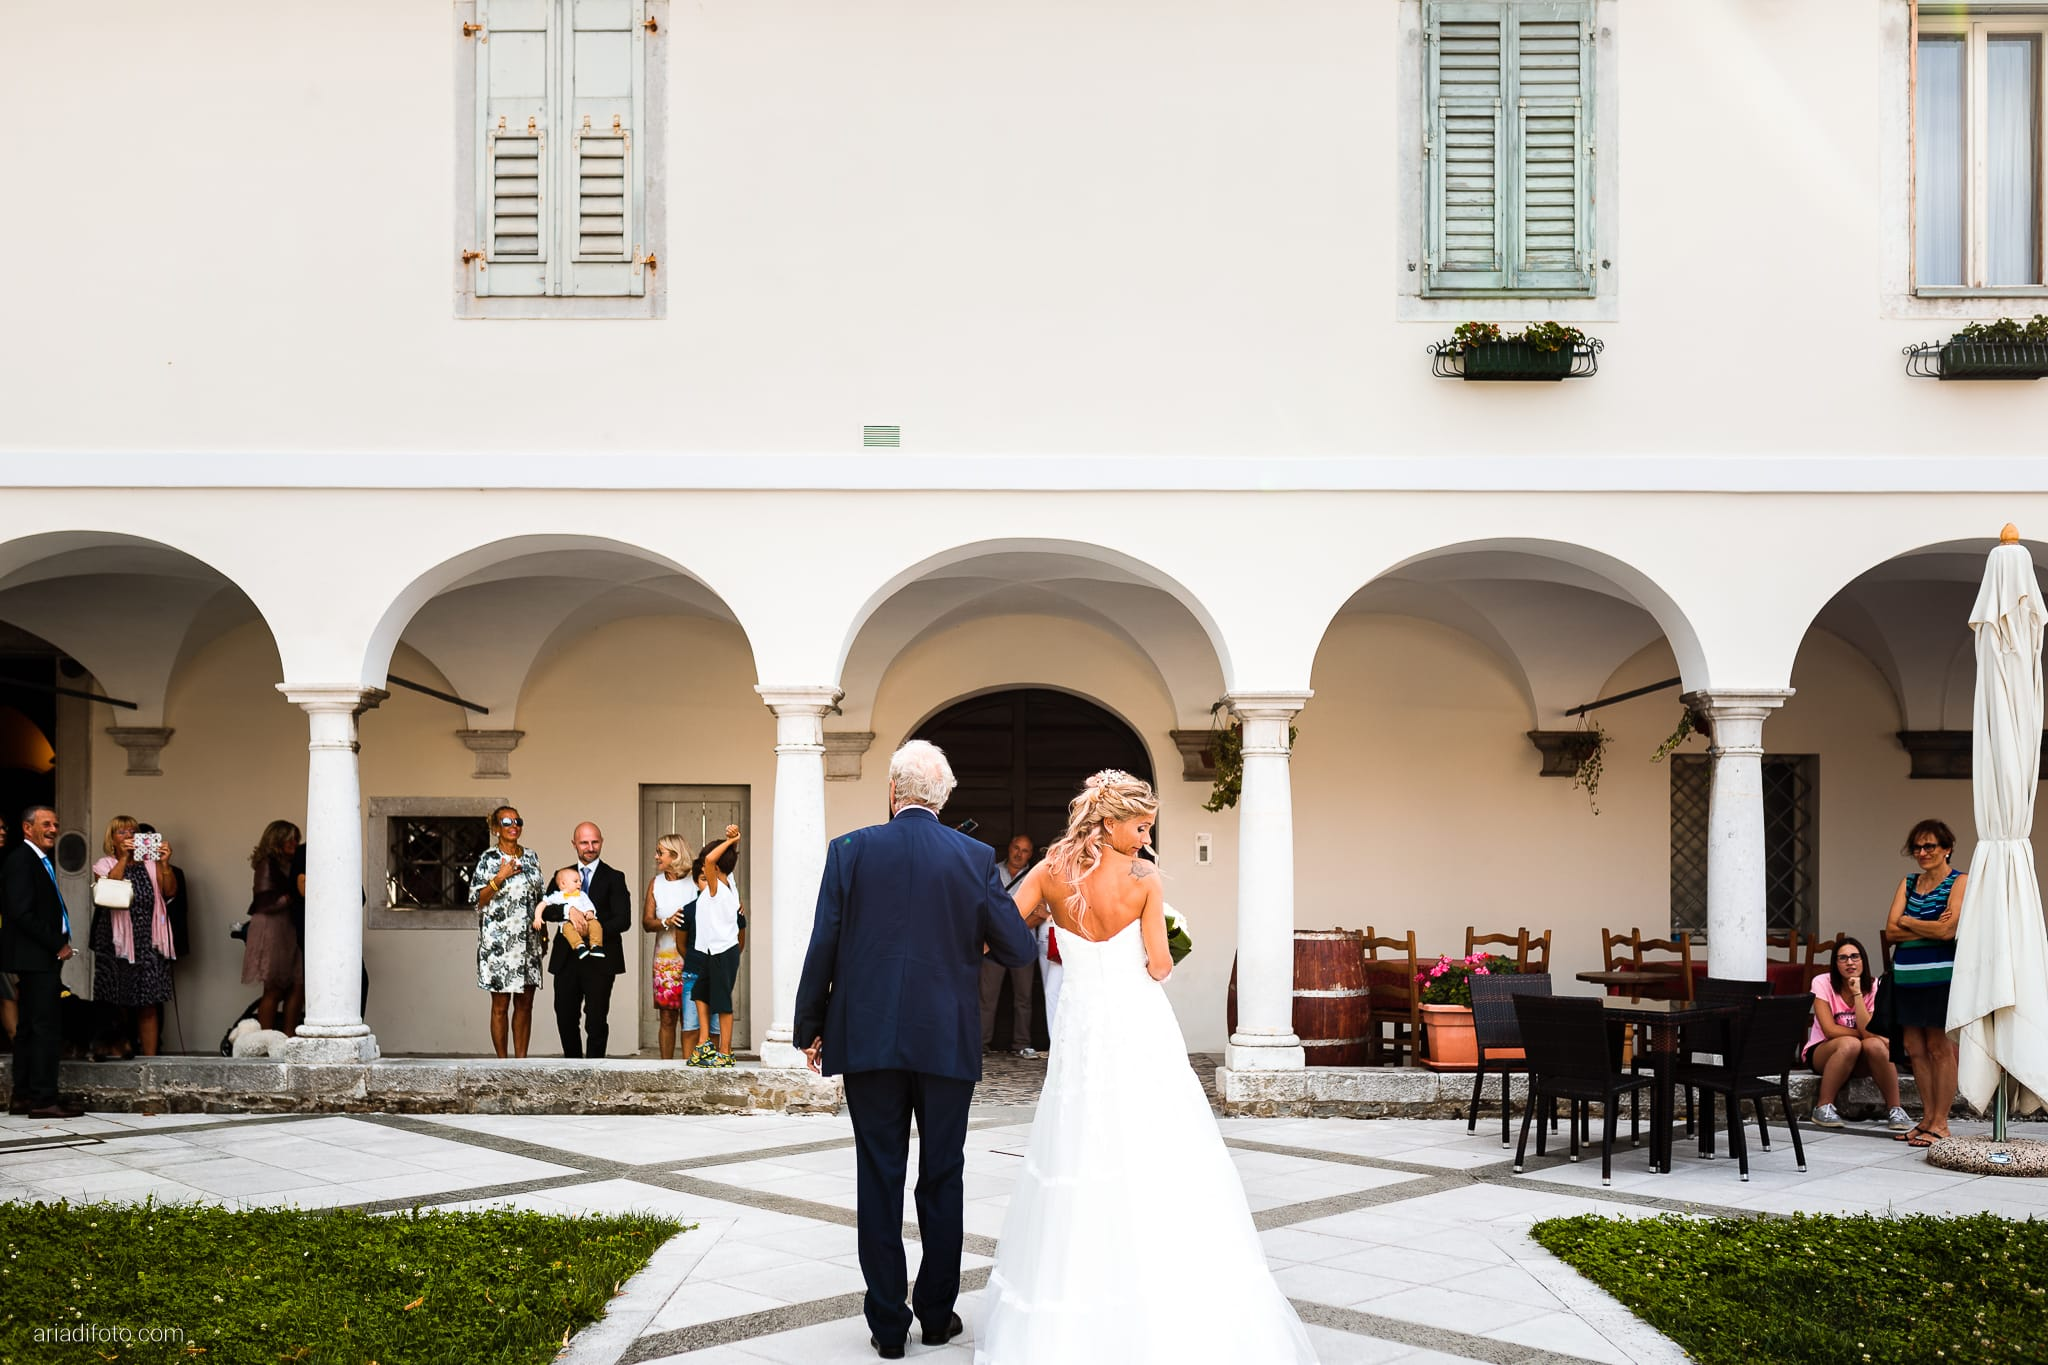 Nicoletta Pierfrancesco Matrimonio Gorizia Villa Attems Lucinico Cerimonia Chiesa Sant'Antonio ingresso sposa